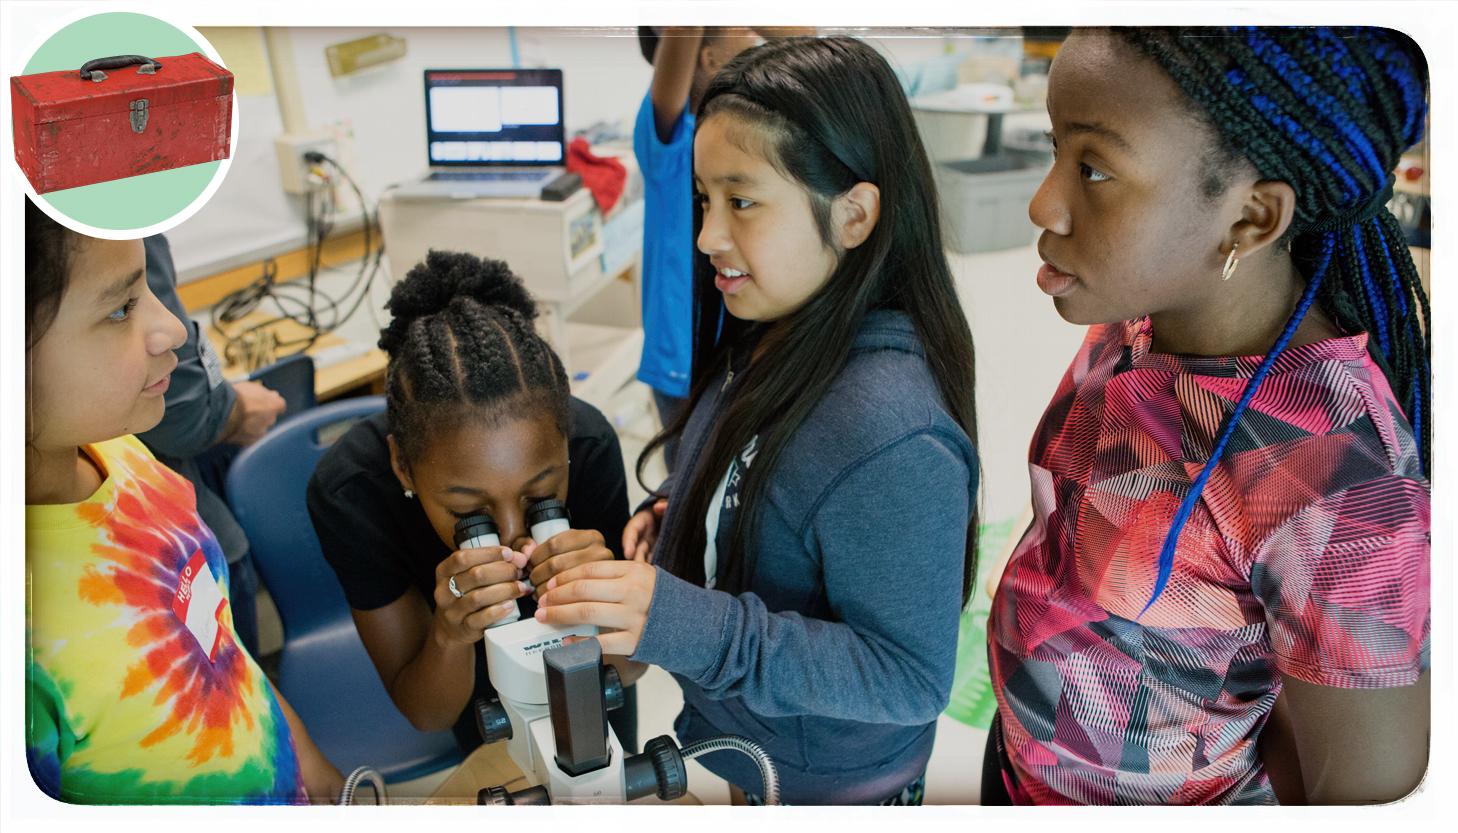 girls using a microscope